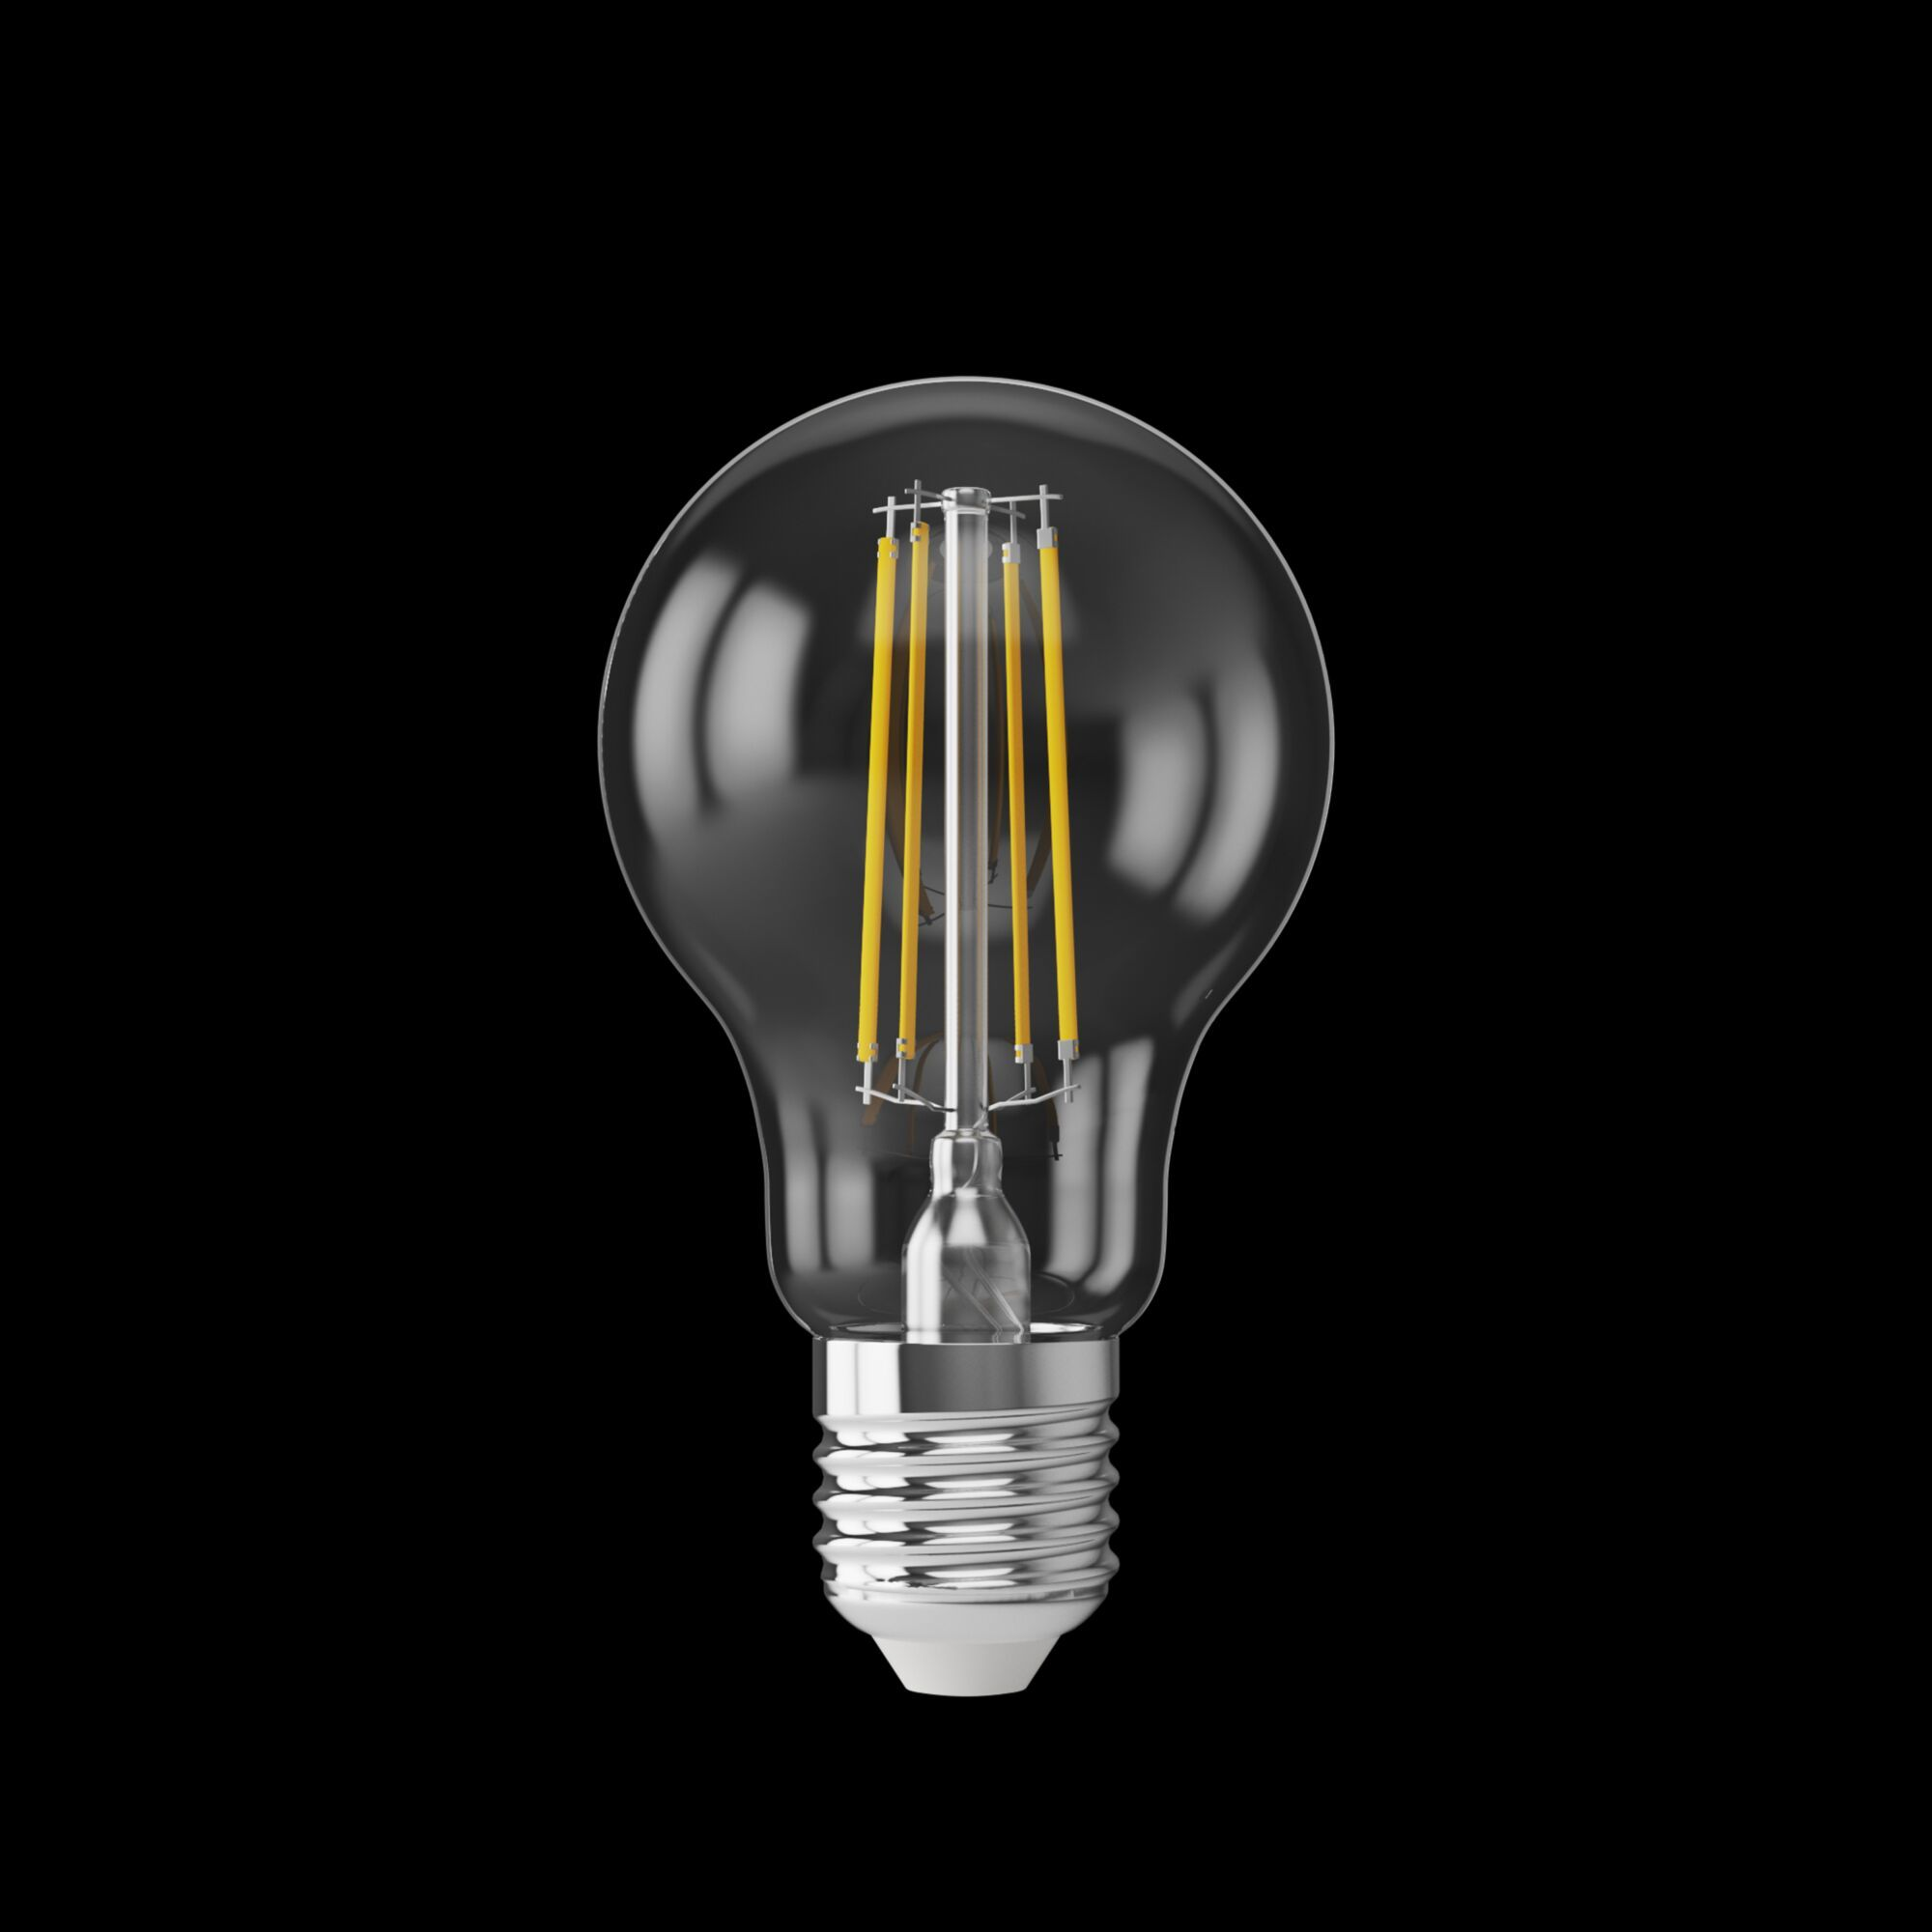 Филаментная светодиодная лампа Voltega VG10-A60E27cold7W-FHR 7155 груша E27 7W, 4000K 220-240V, гарантия 3 года - фото 3